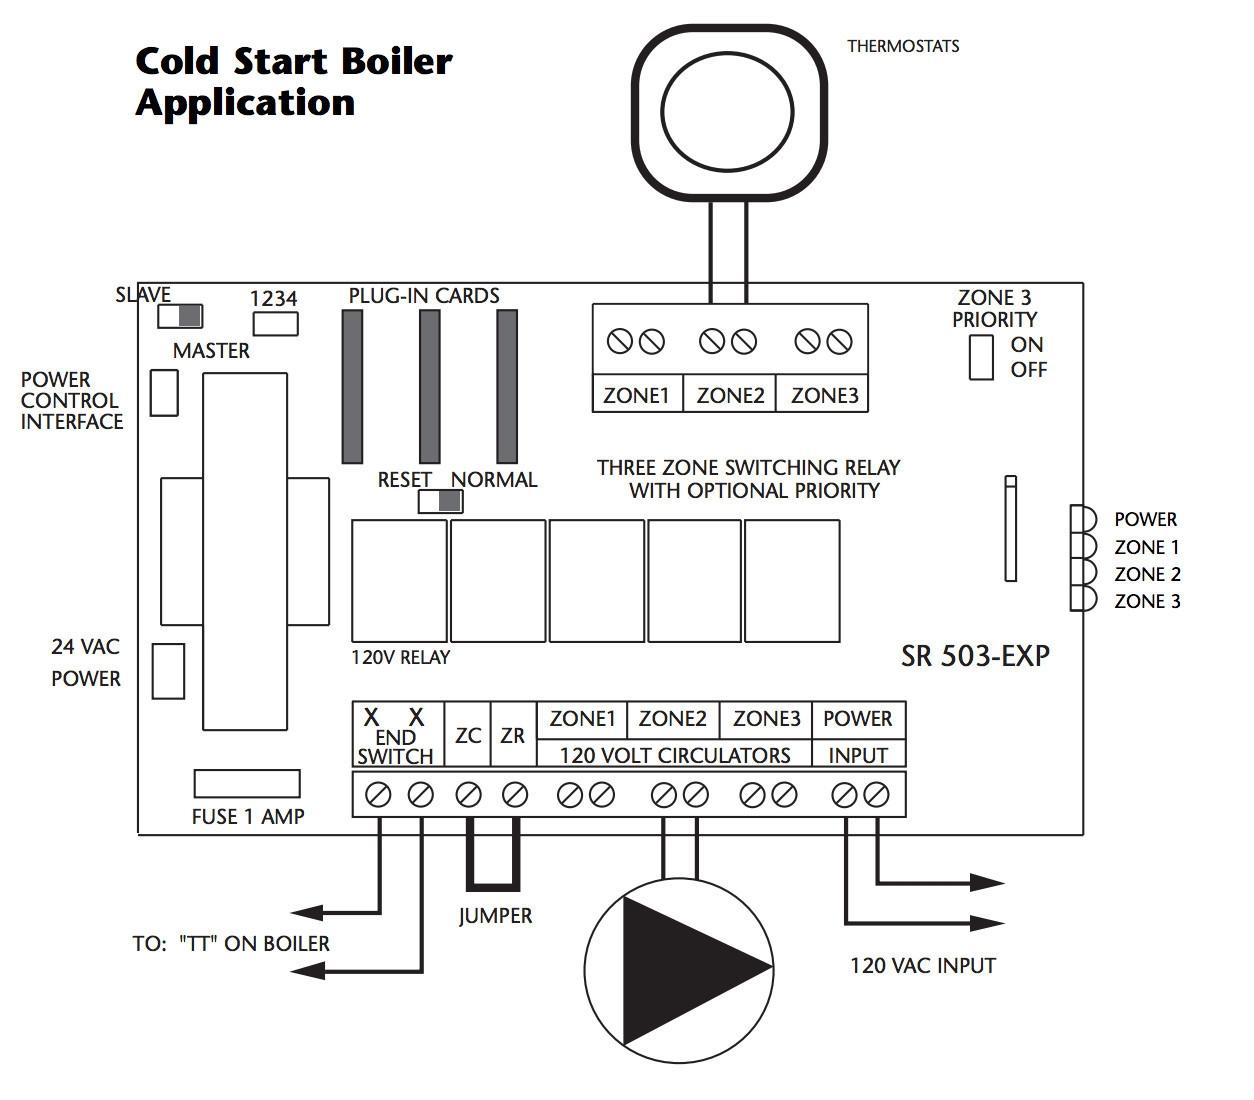 wb21x5243 wiring diagram Download-Wb21x5243 Wiring Diagram Taco 006 B4 Wiring Diagram Download Esbysjqkonqm Taco Cartridge Circulator 007 F5 17-e